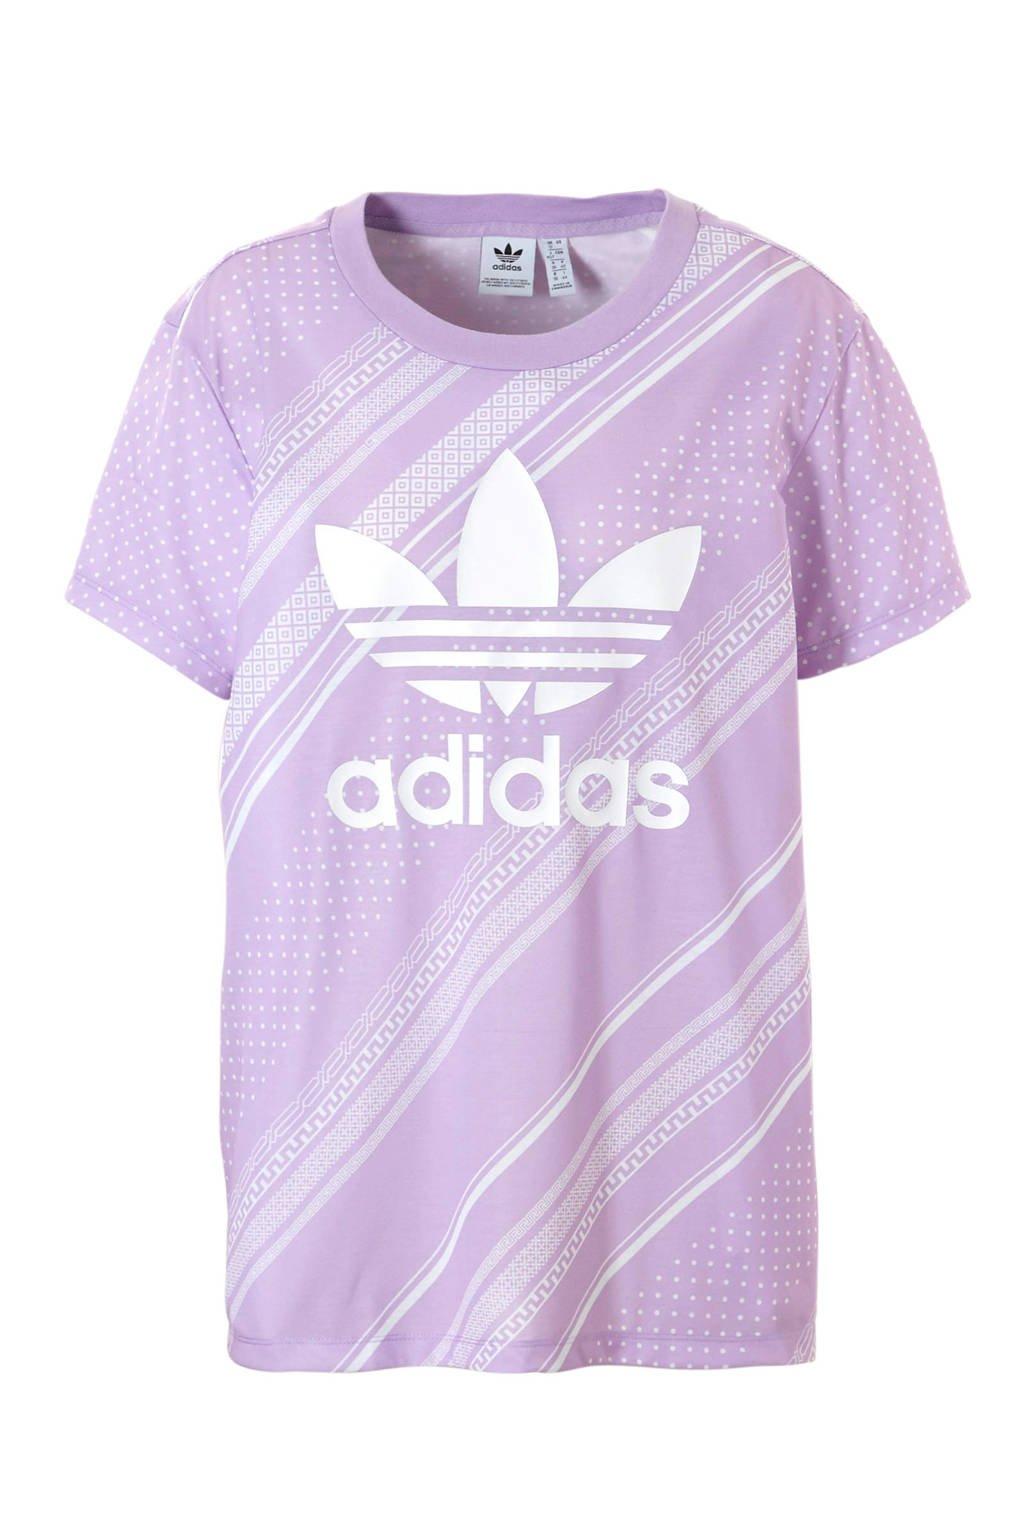 adidas originals T-shirt met all over print paars/wit, Paars/wit